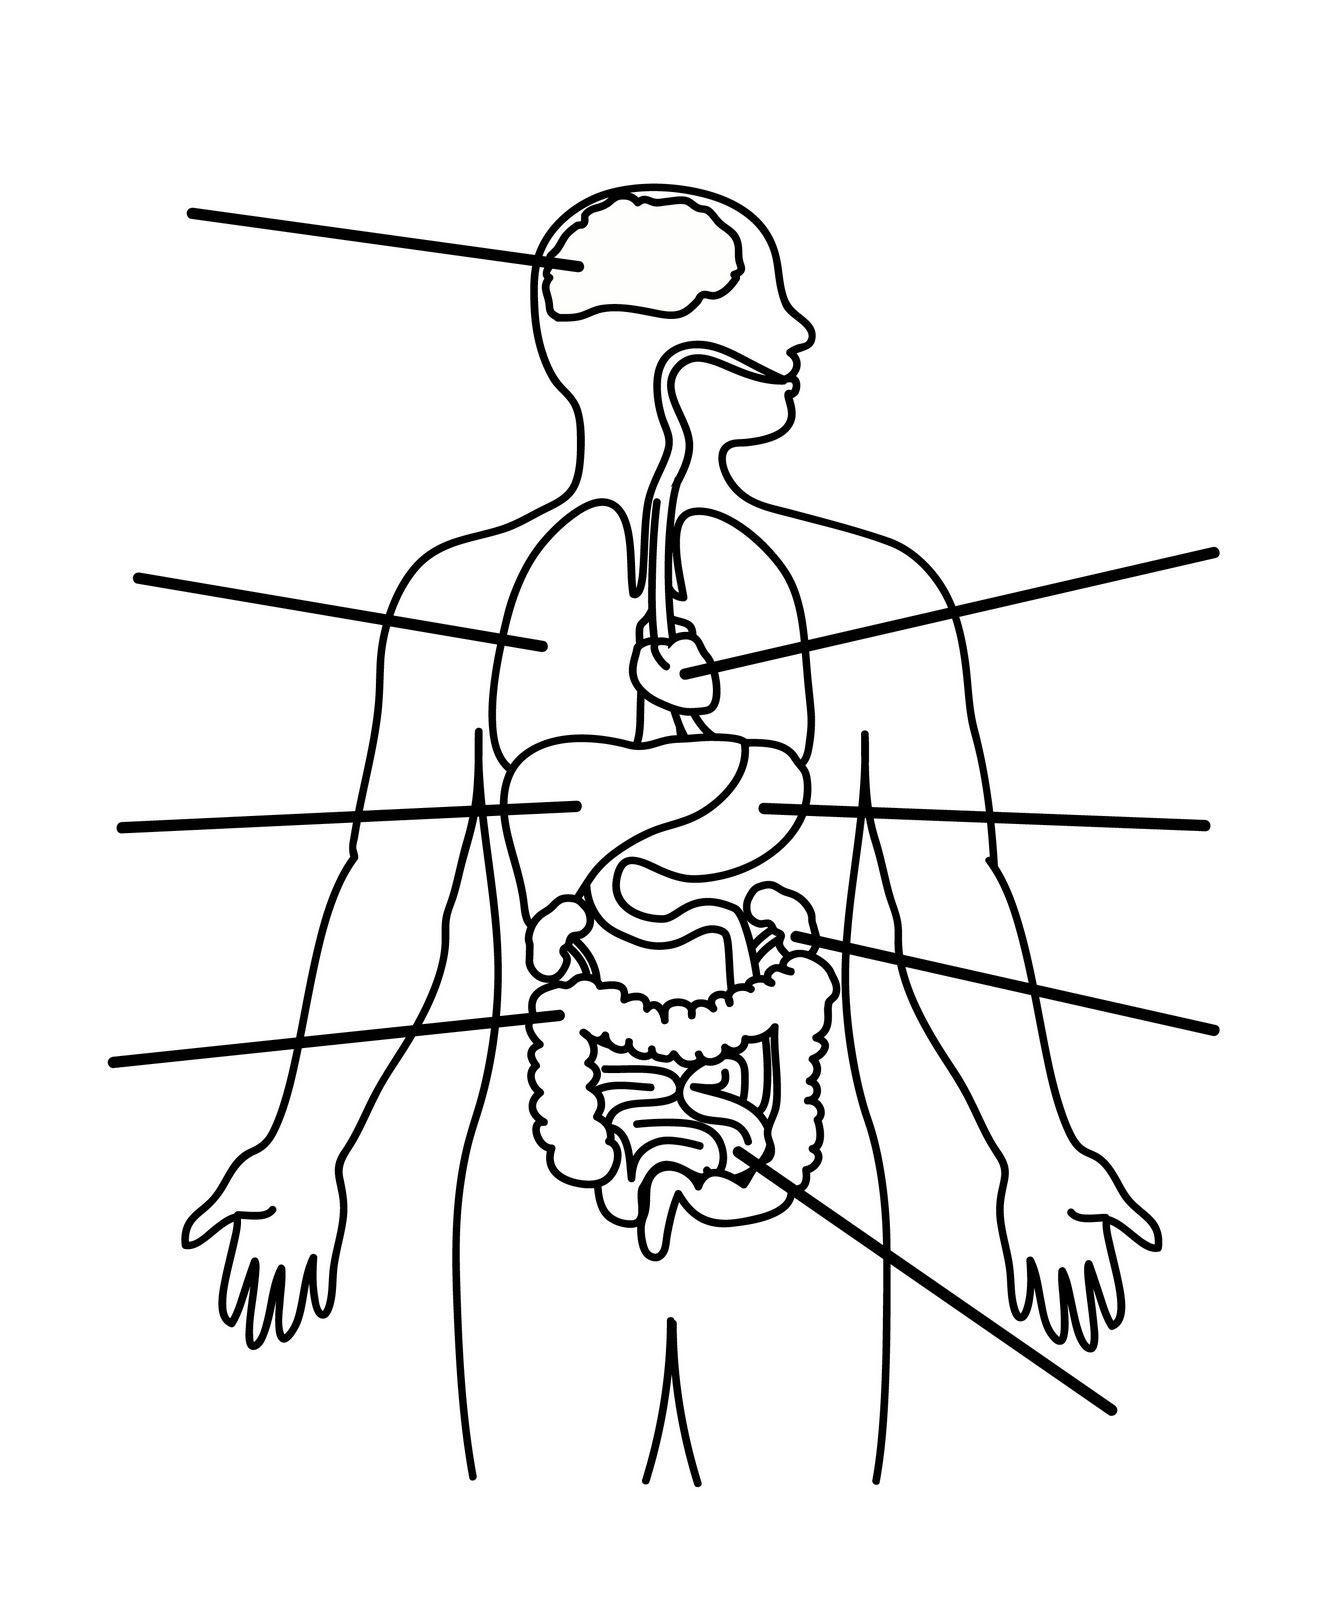 Human Body Organs Worksheets Human Body Anatomy